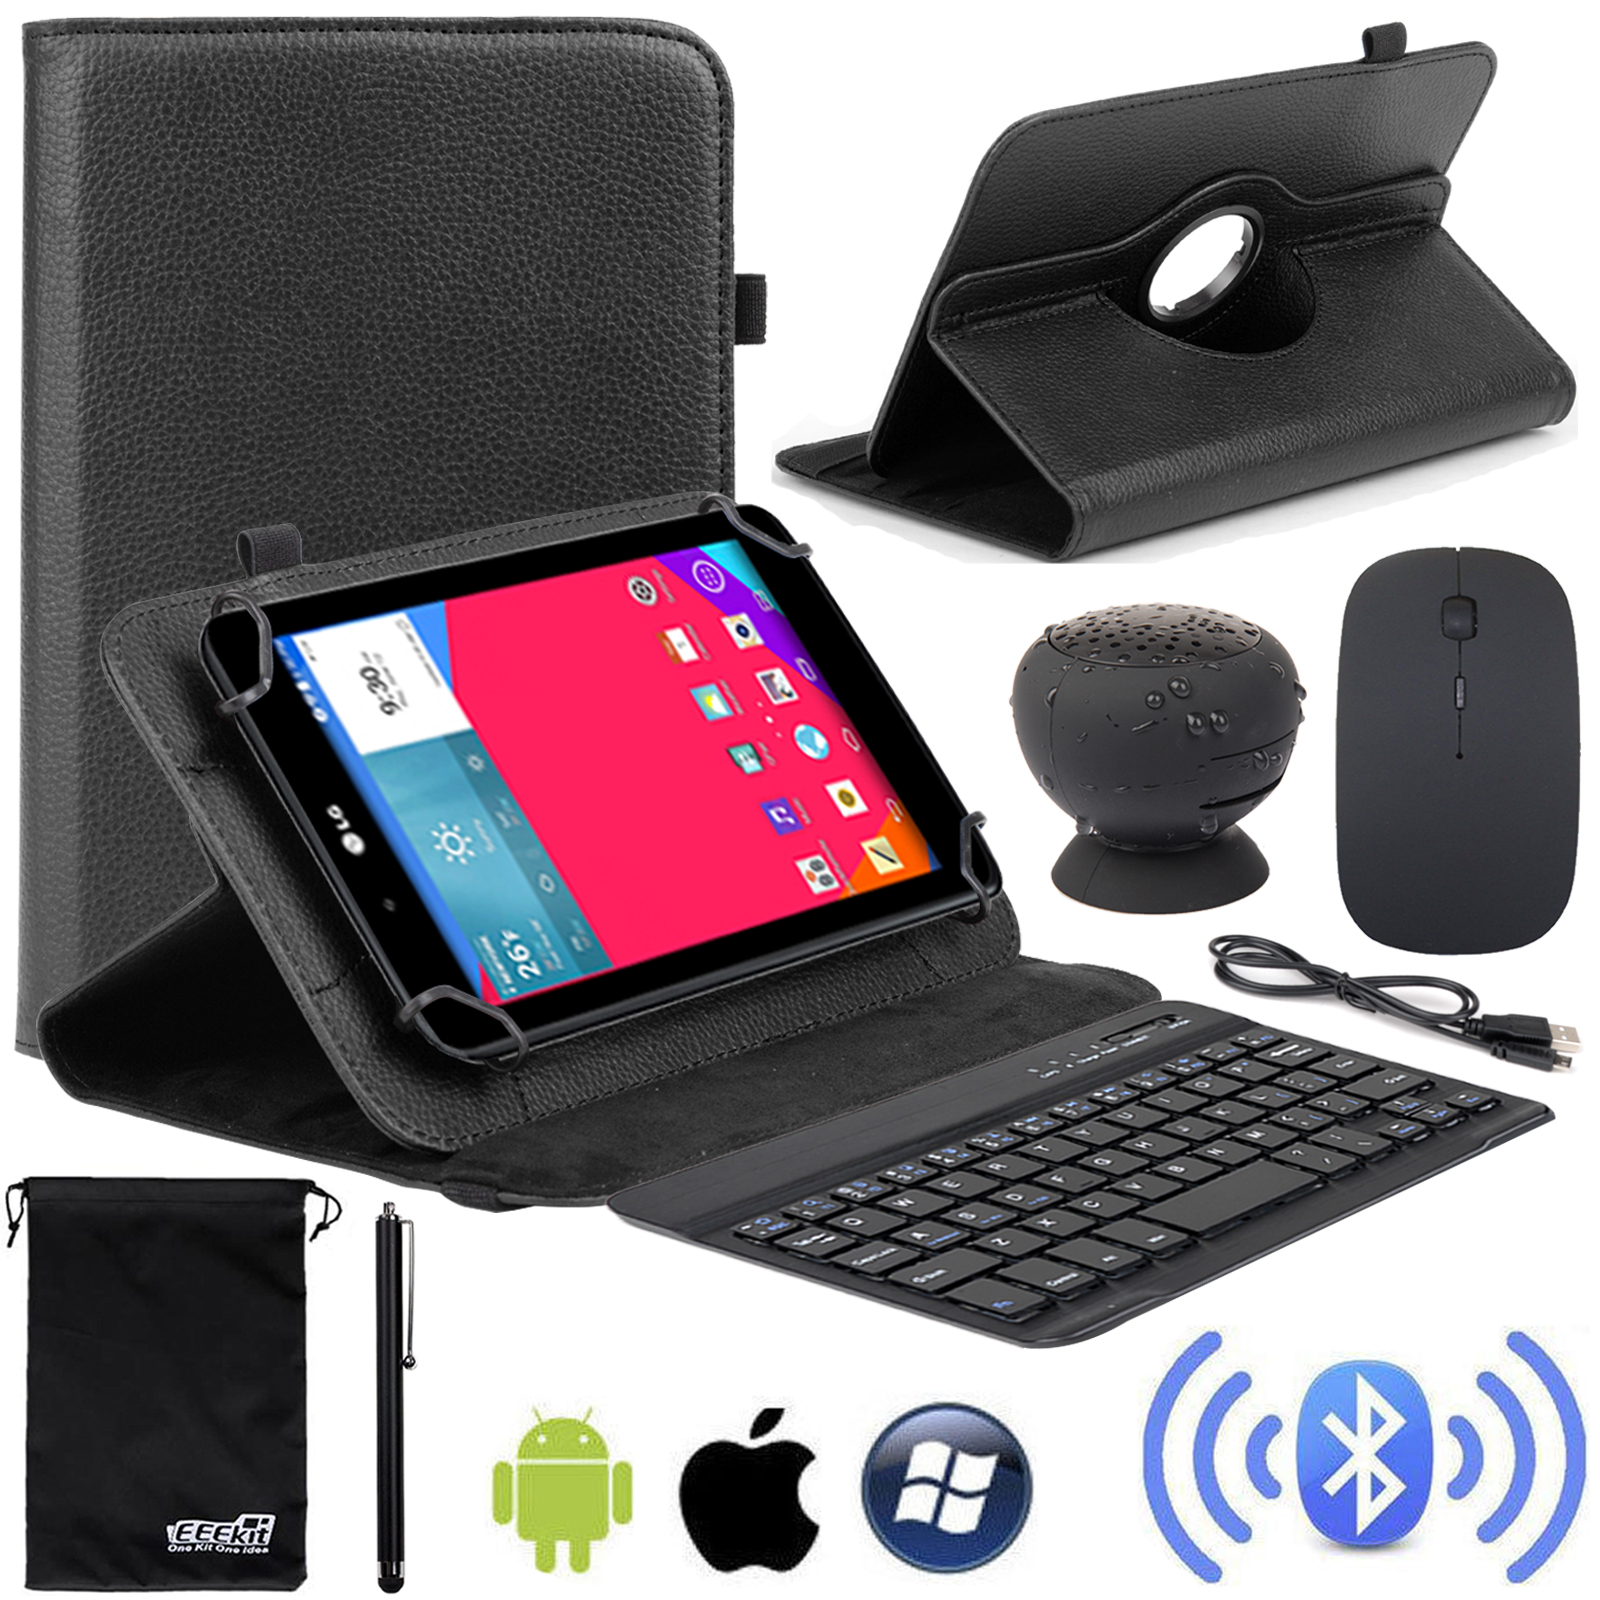 EEEKit Universal 4in1 Kit for 7 inch Tablet NOOK Tablet 7...